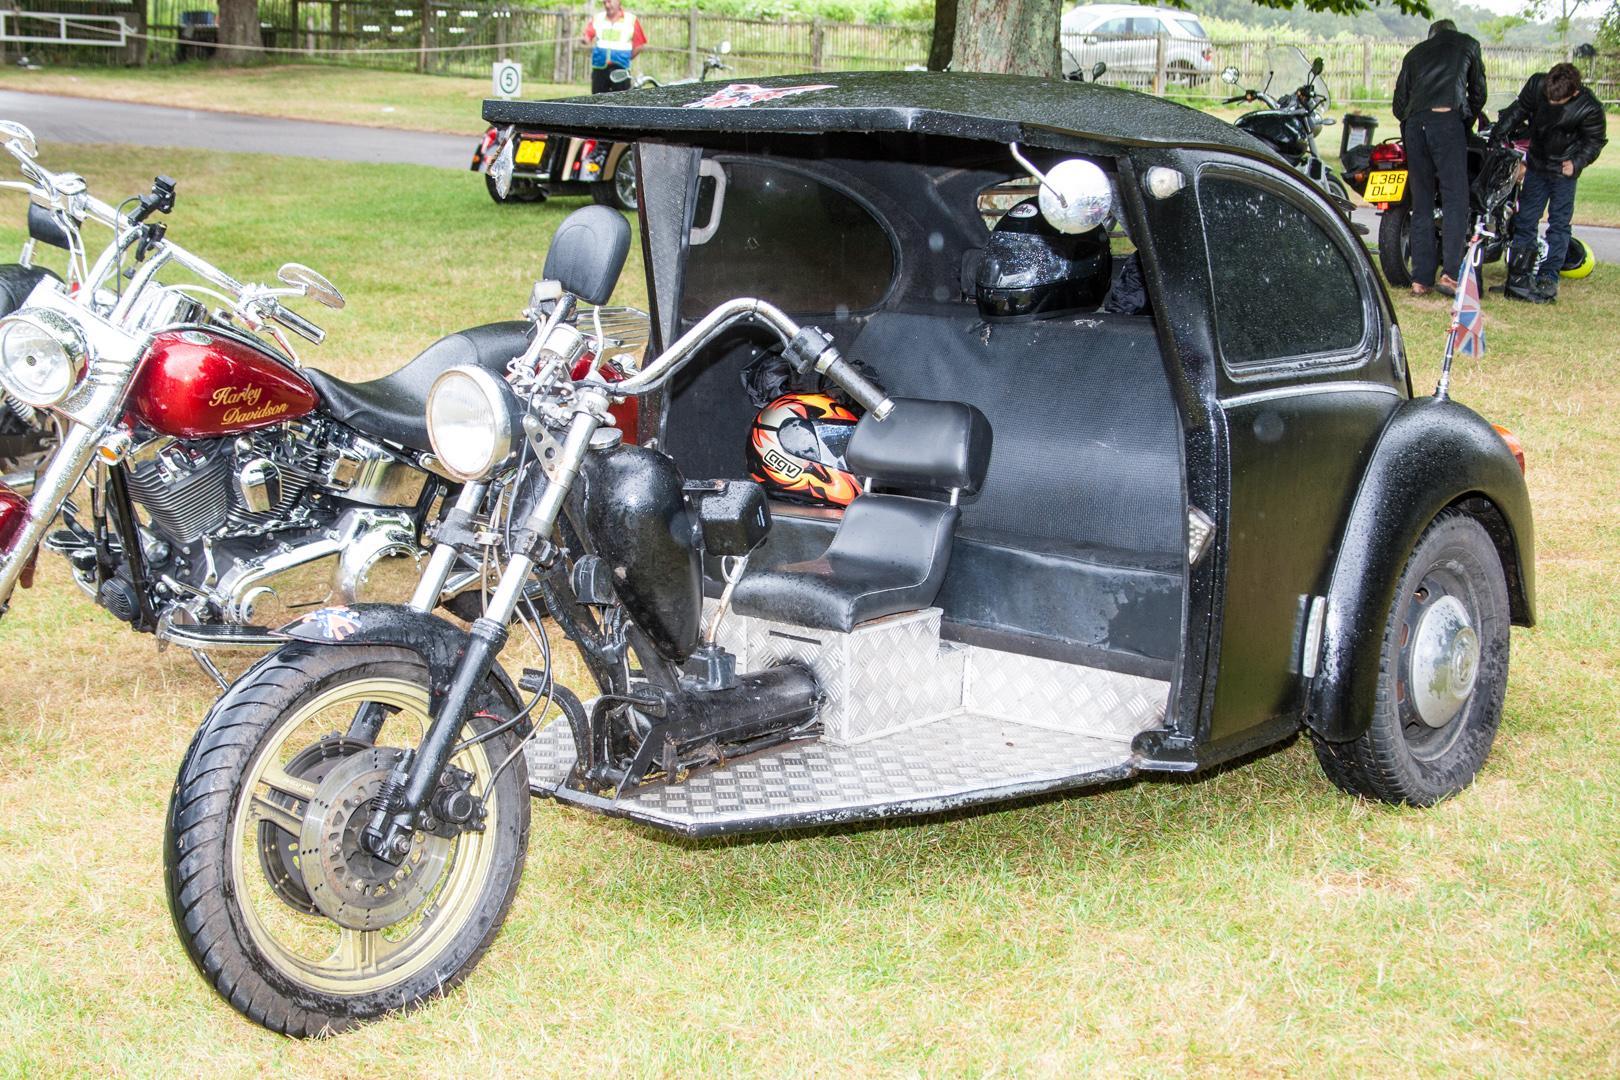 2015 Simply Bikes Vw Beetle Trike Classiccars Com Journal